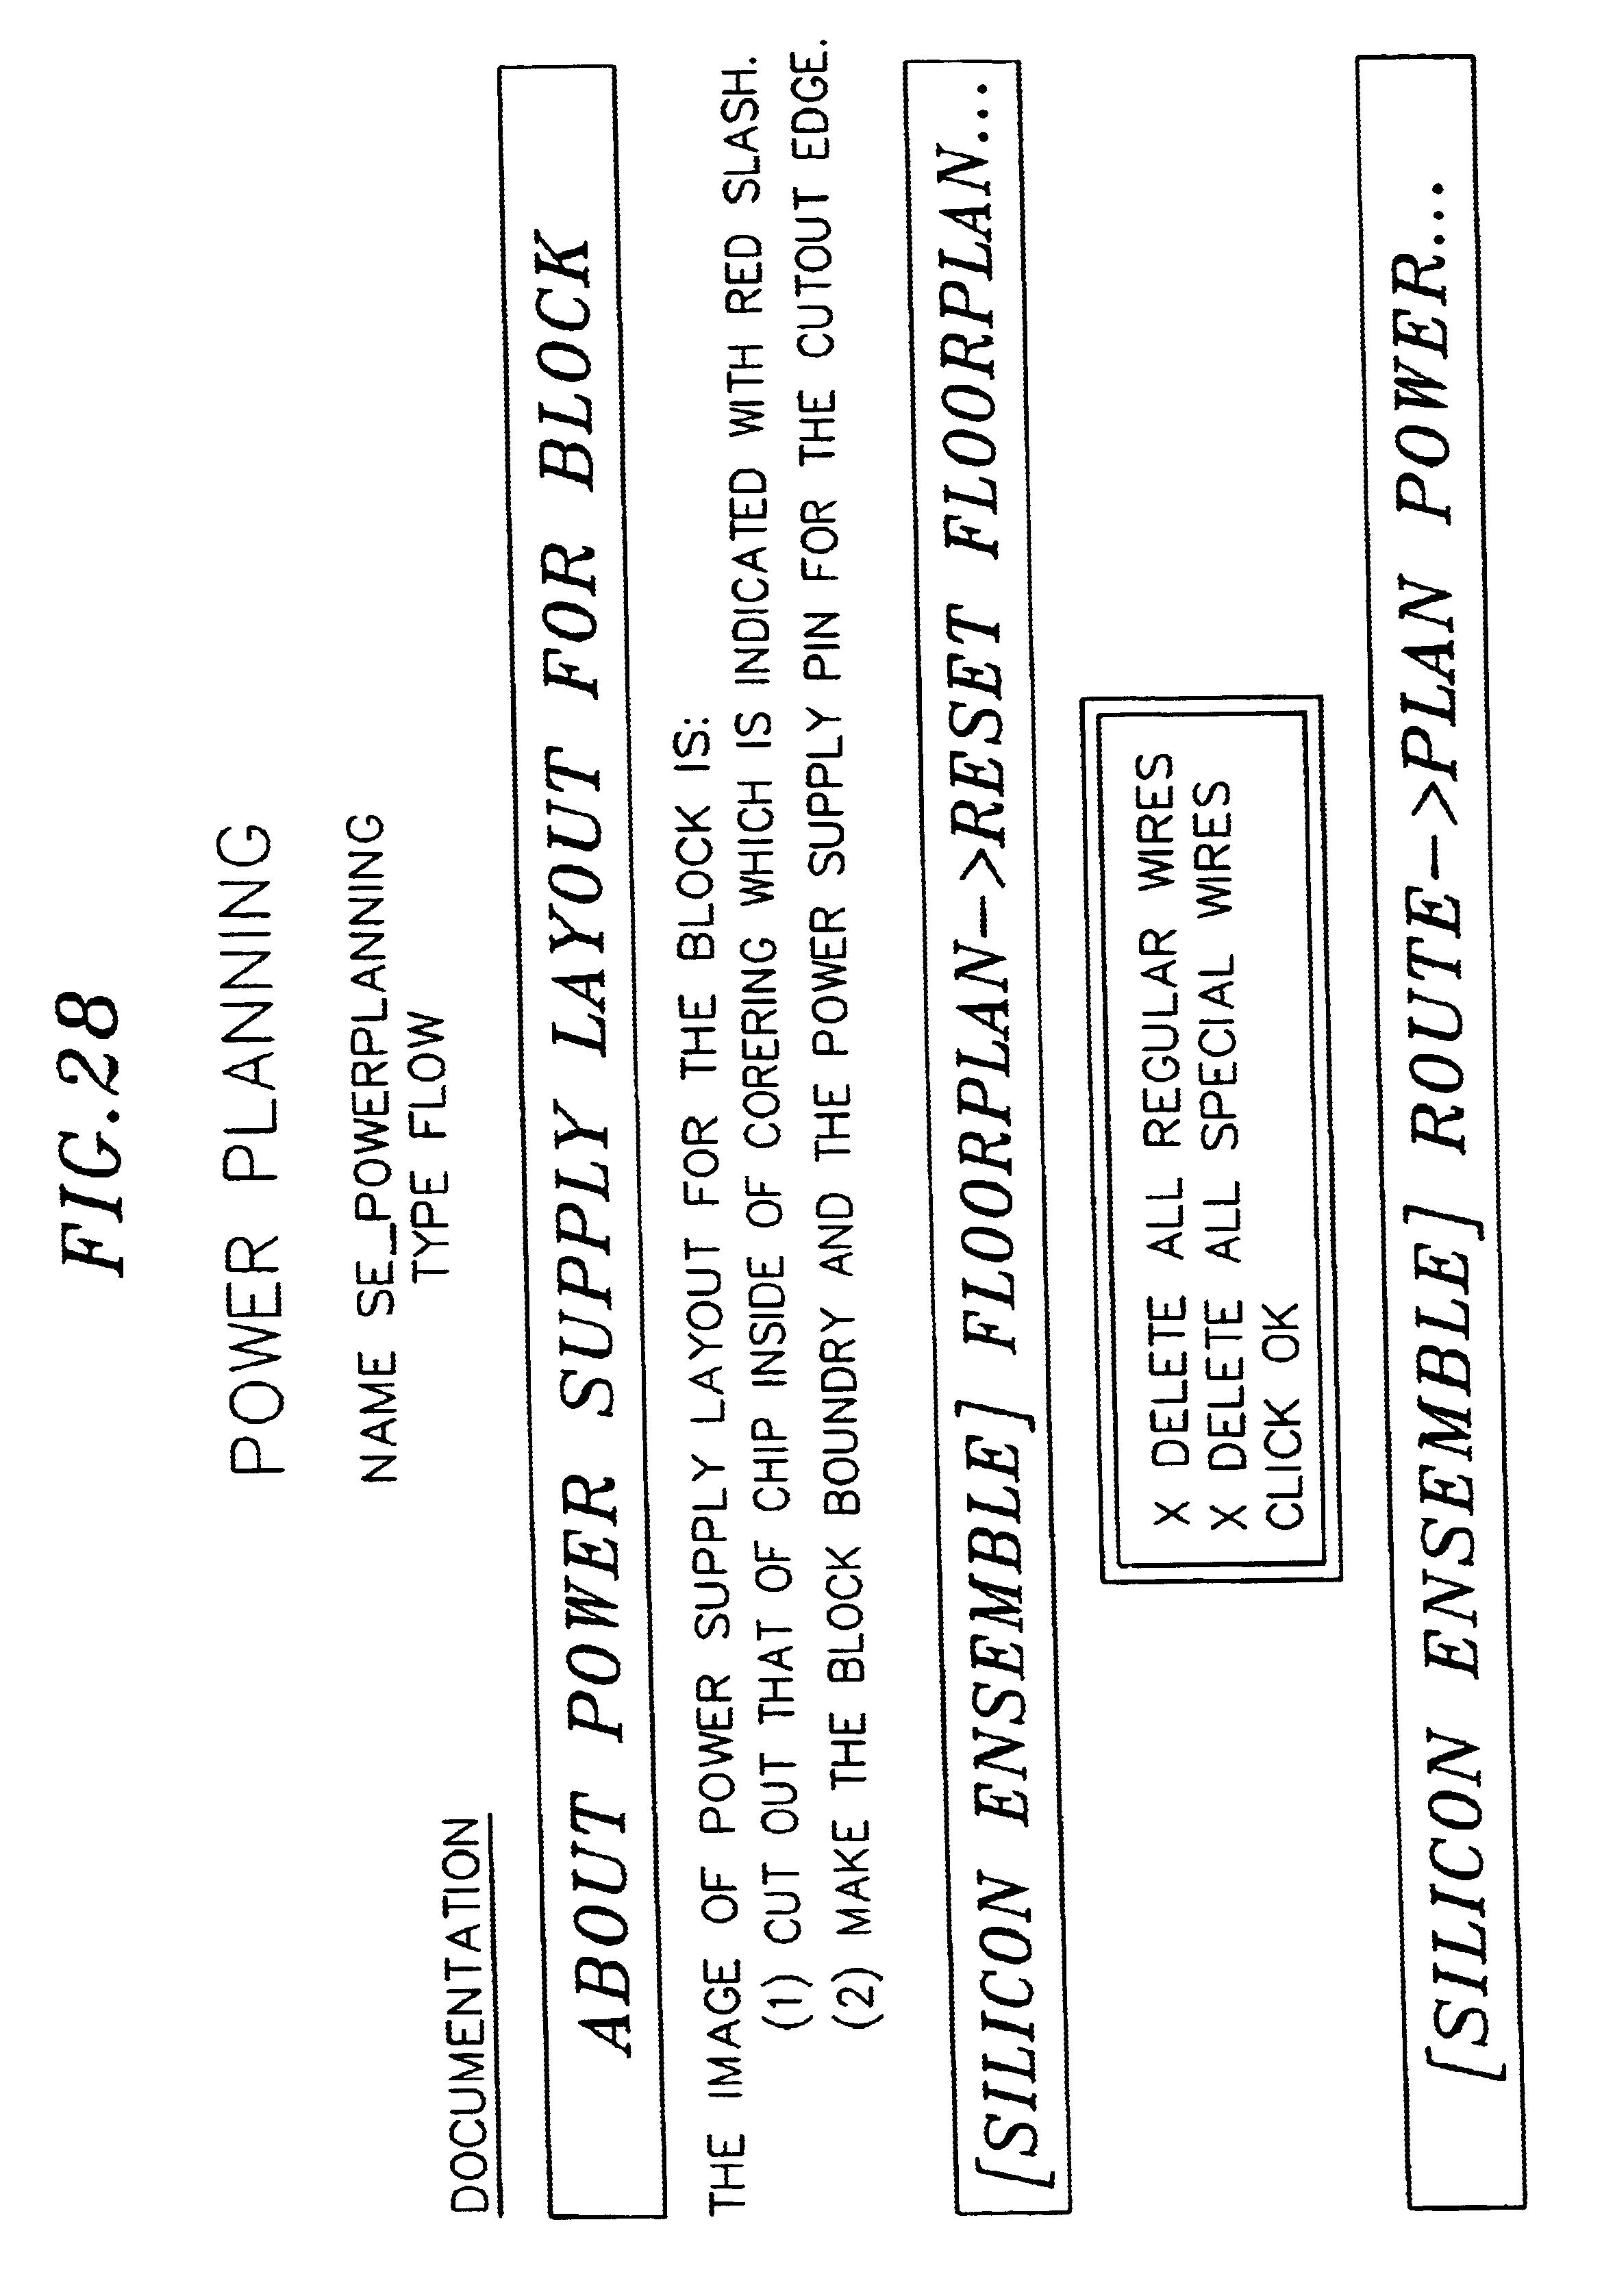 patente us6634008